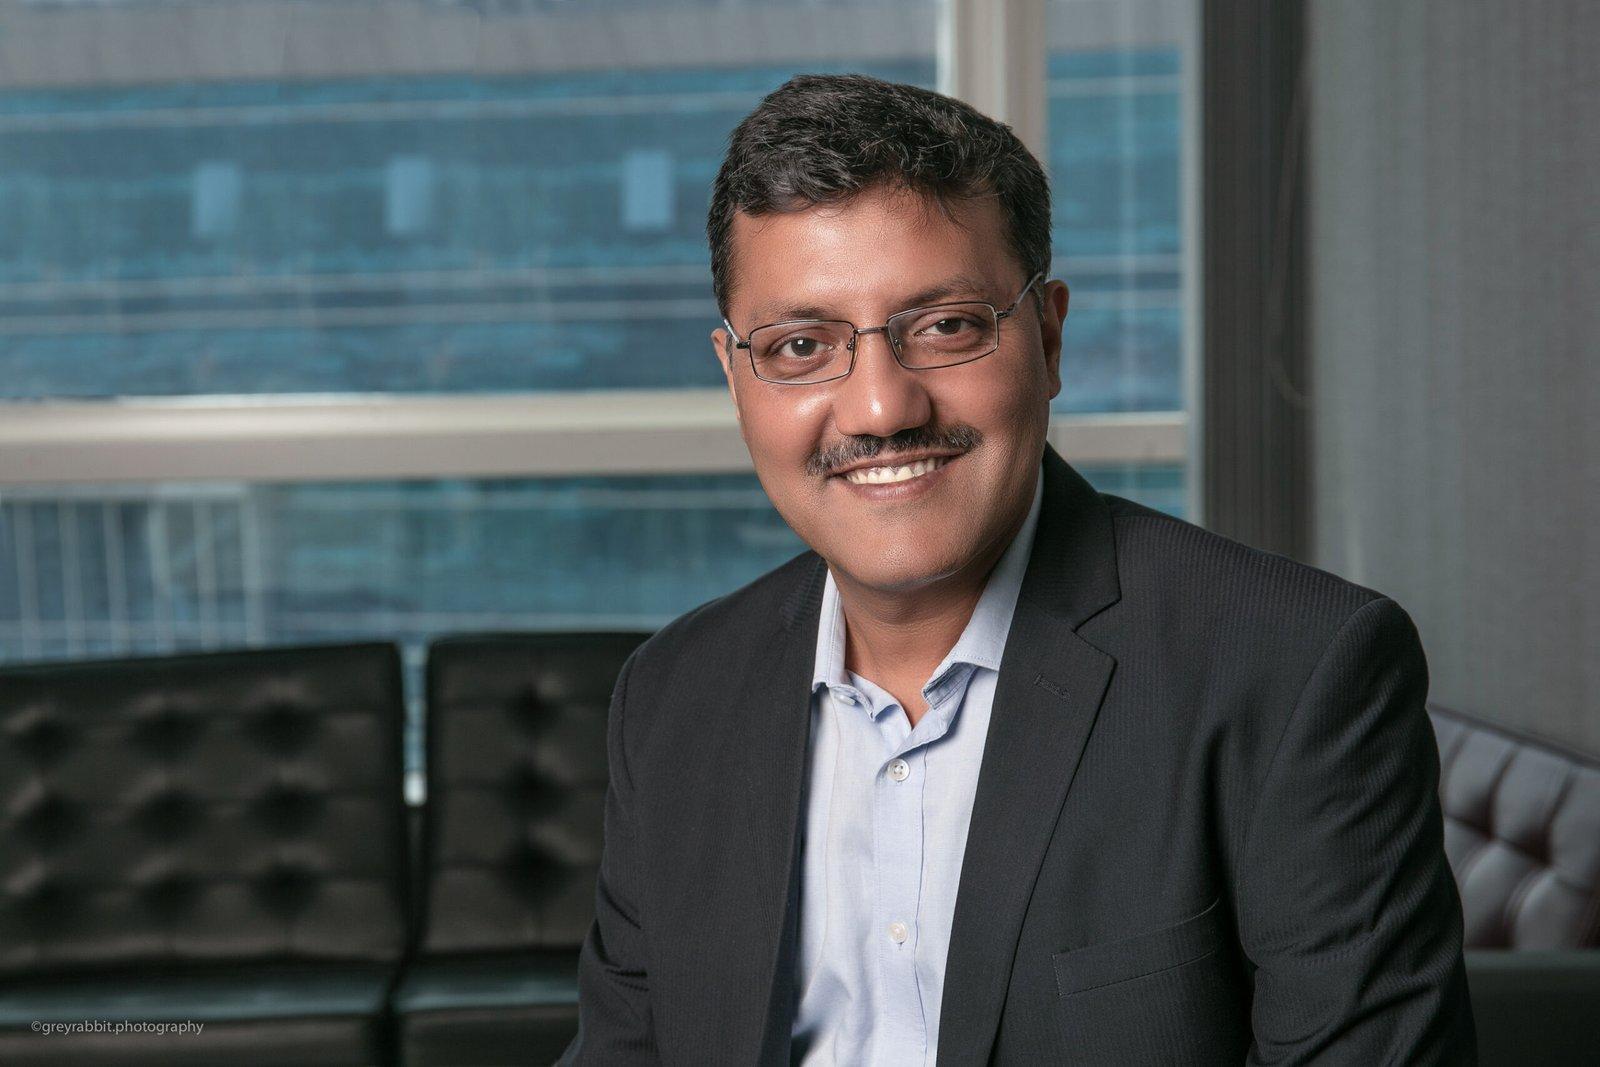 Mr. Yogesh Mudras, Managing Director, Informa Markets in India